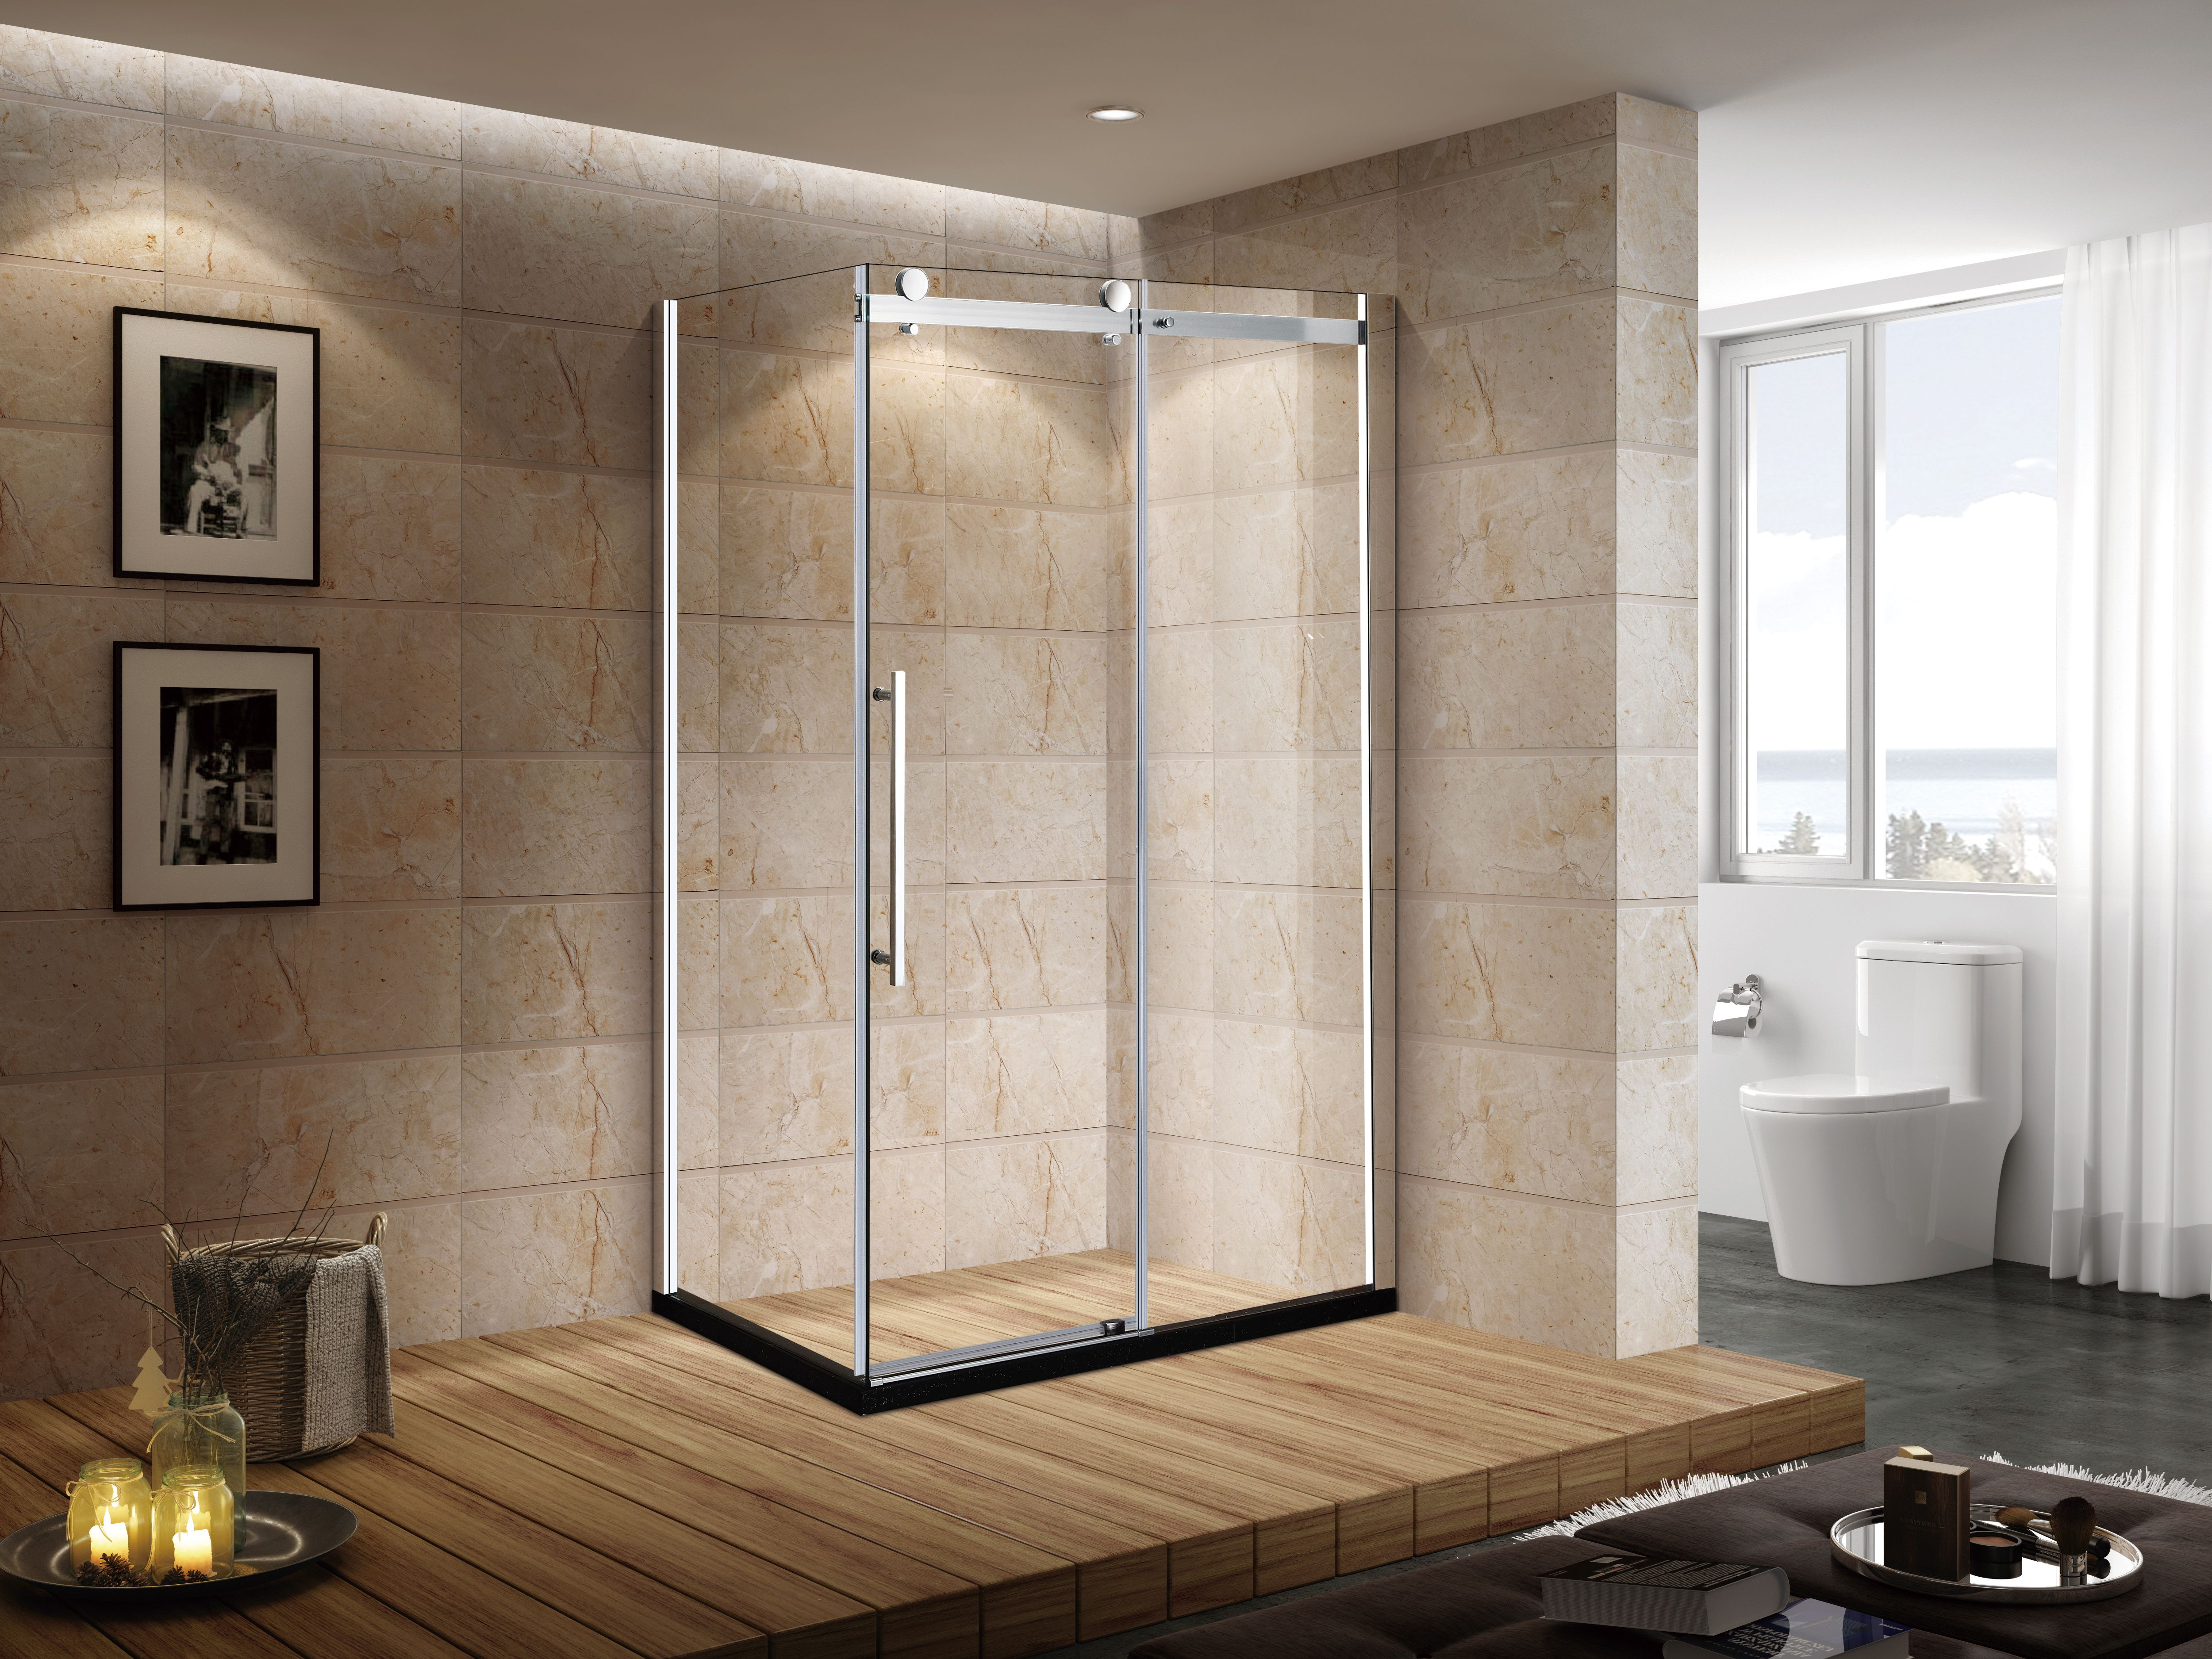 semi frame r85 bathroom double vanity small bathroom cabinets